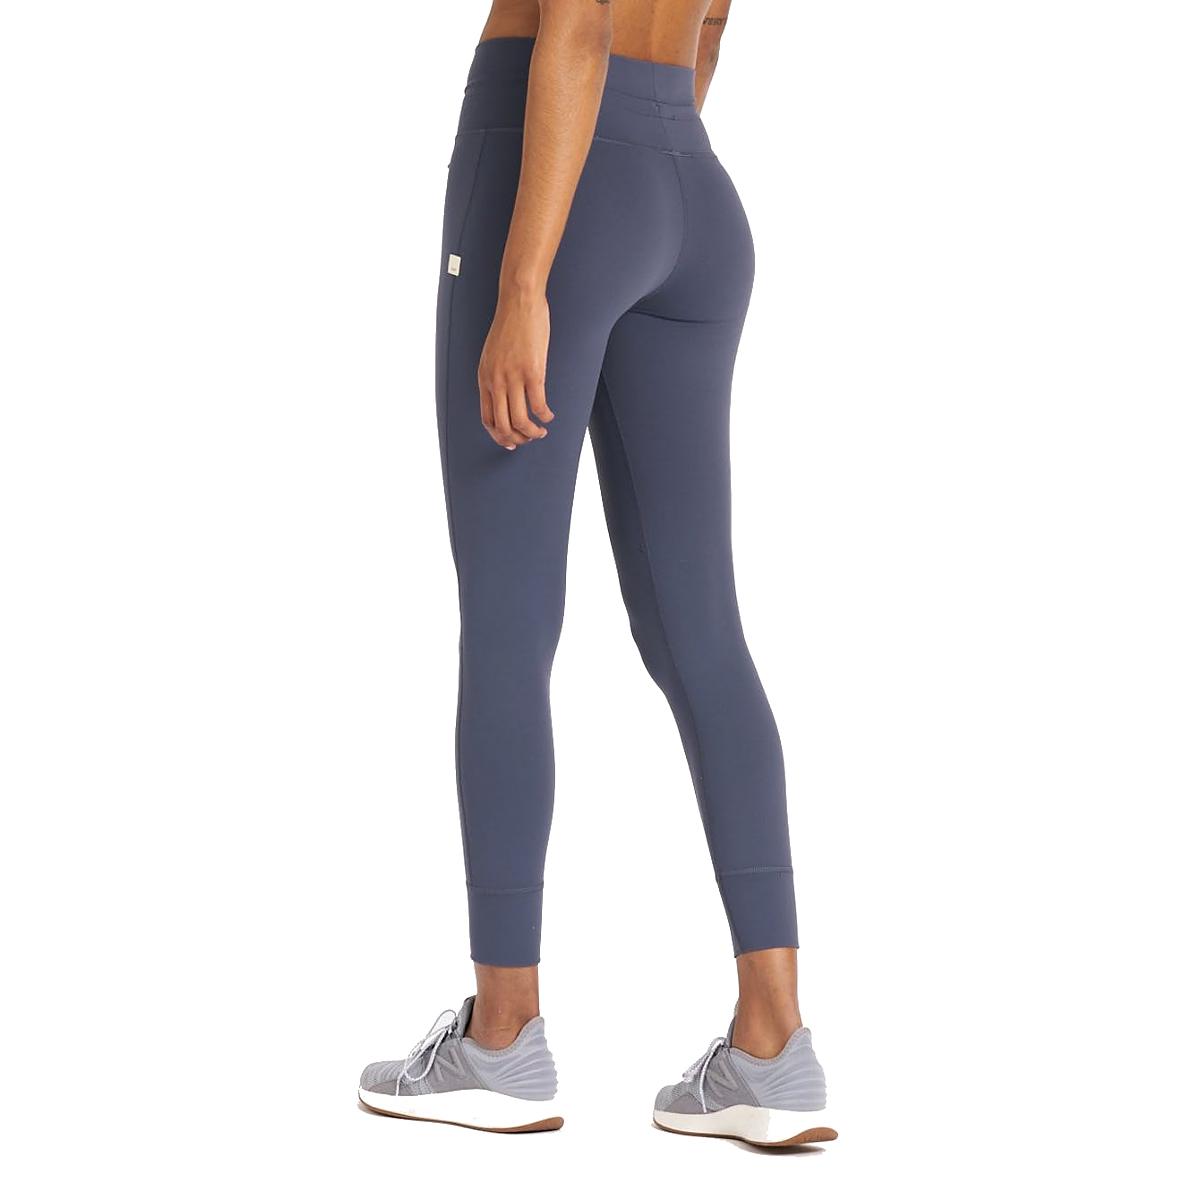 Women's Vuori Daily Legging  - Color: Ocean - Size: M, Ocean, large, image 3